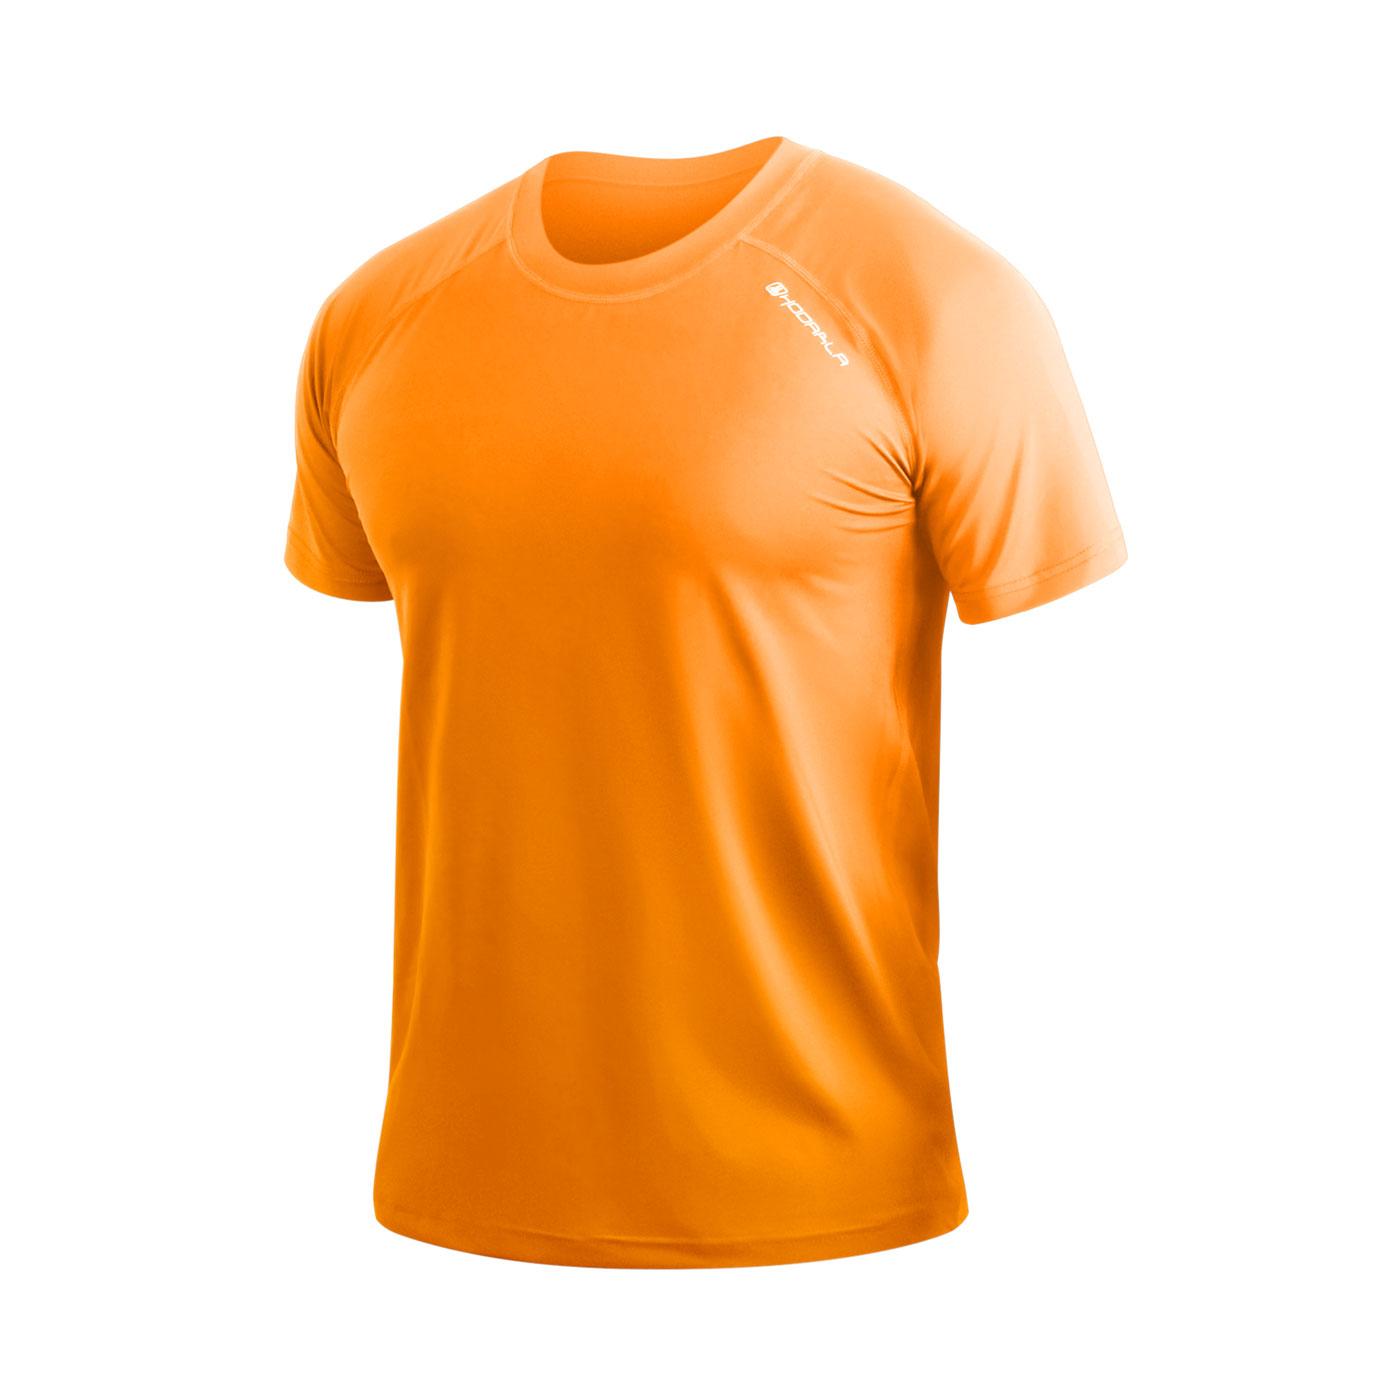 HODARLA 無拘束輕彈機能衣 3114801 - 橘